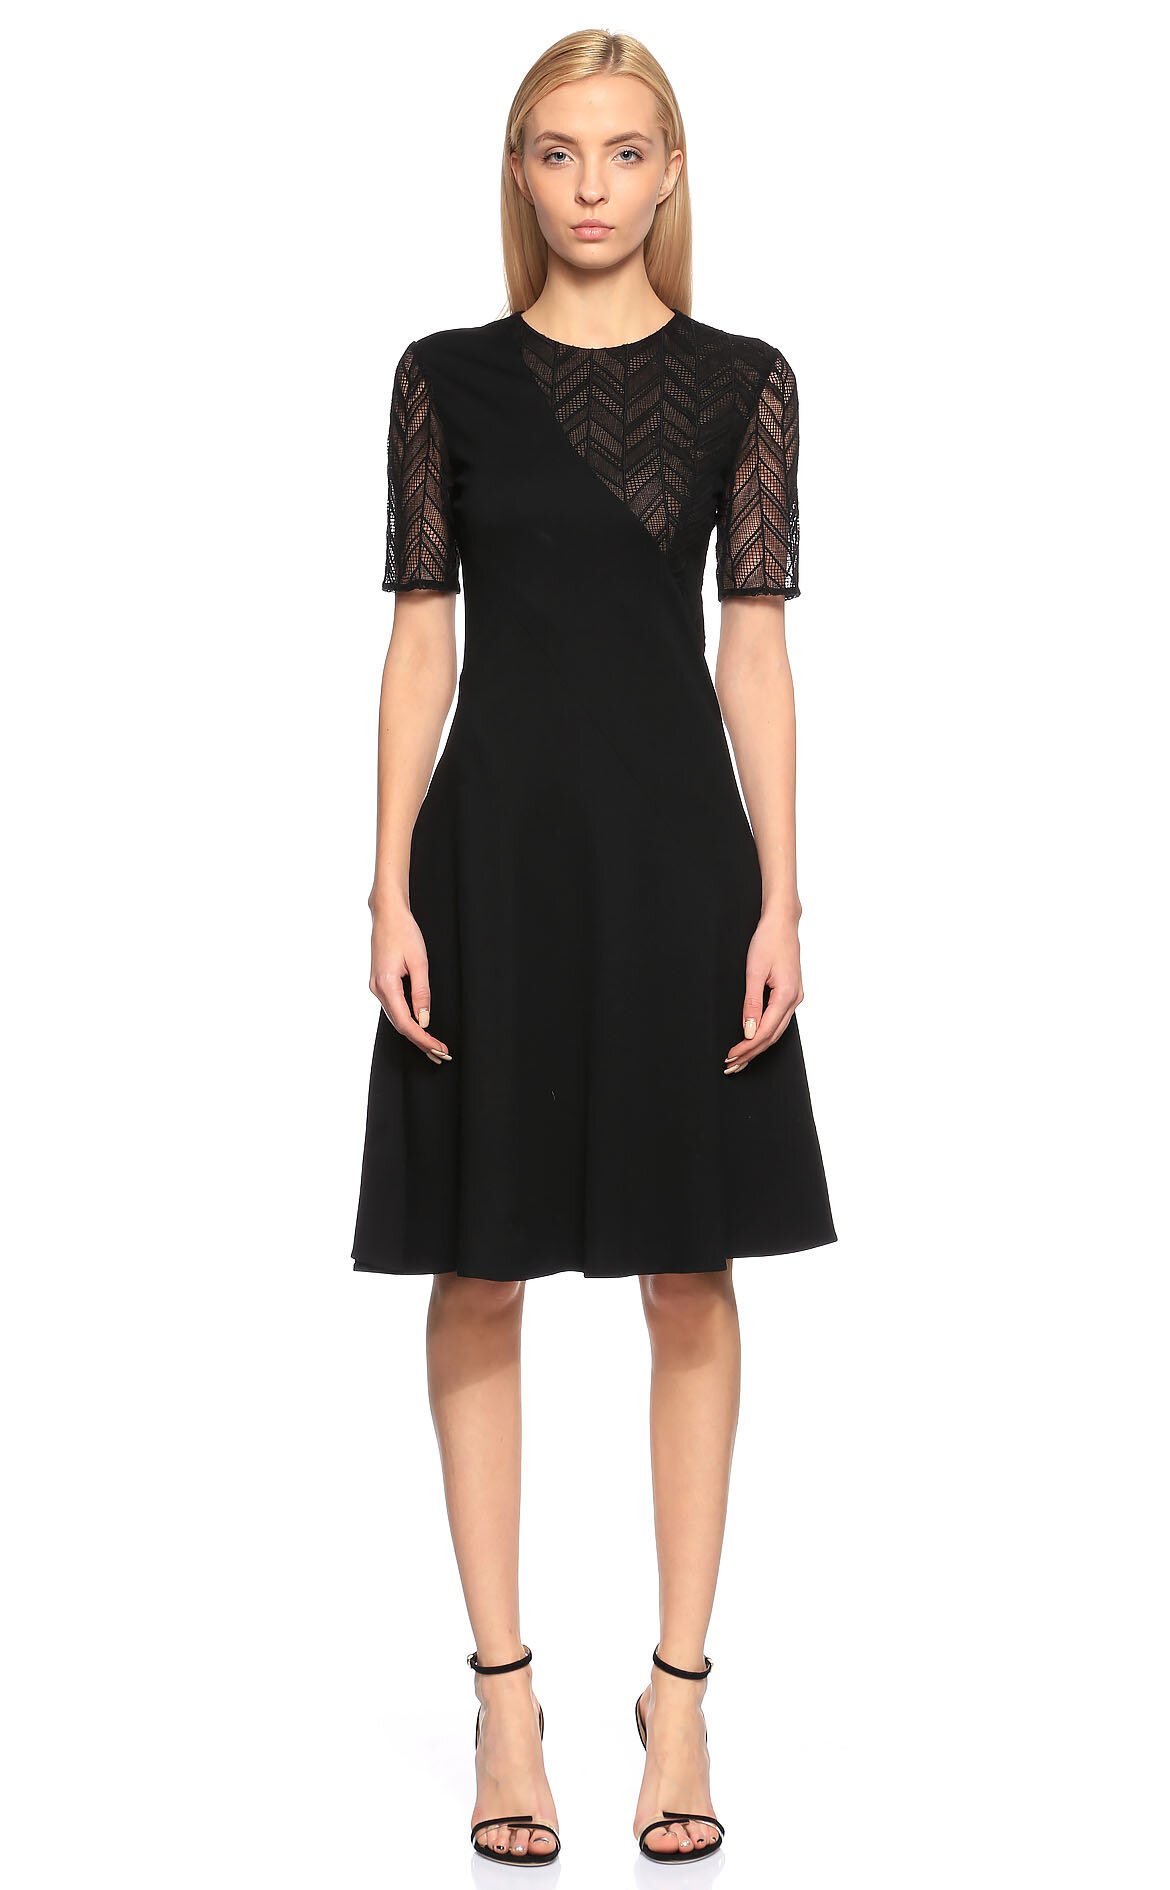 Jason Wu  Dantel İşlemeli Siyah Elbise